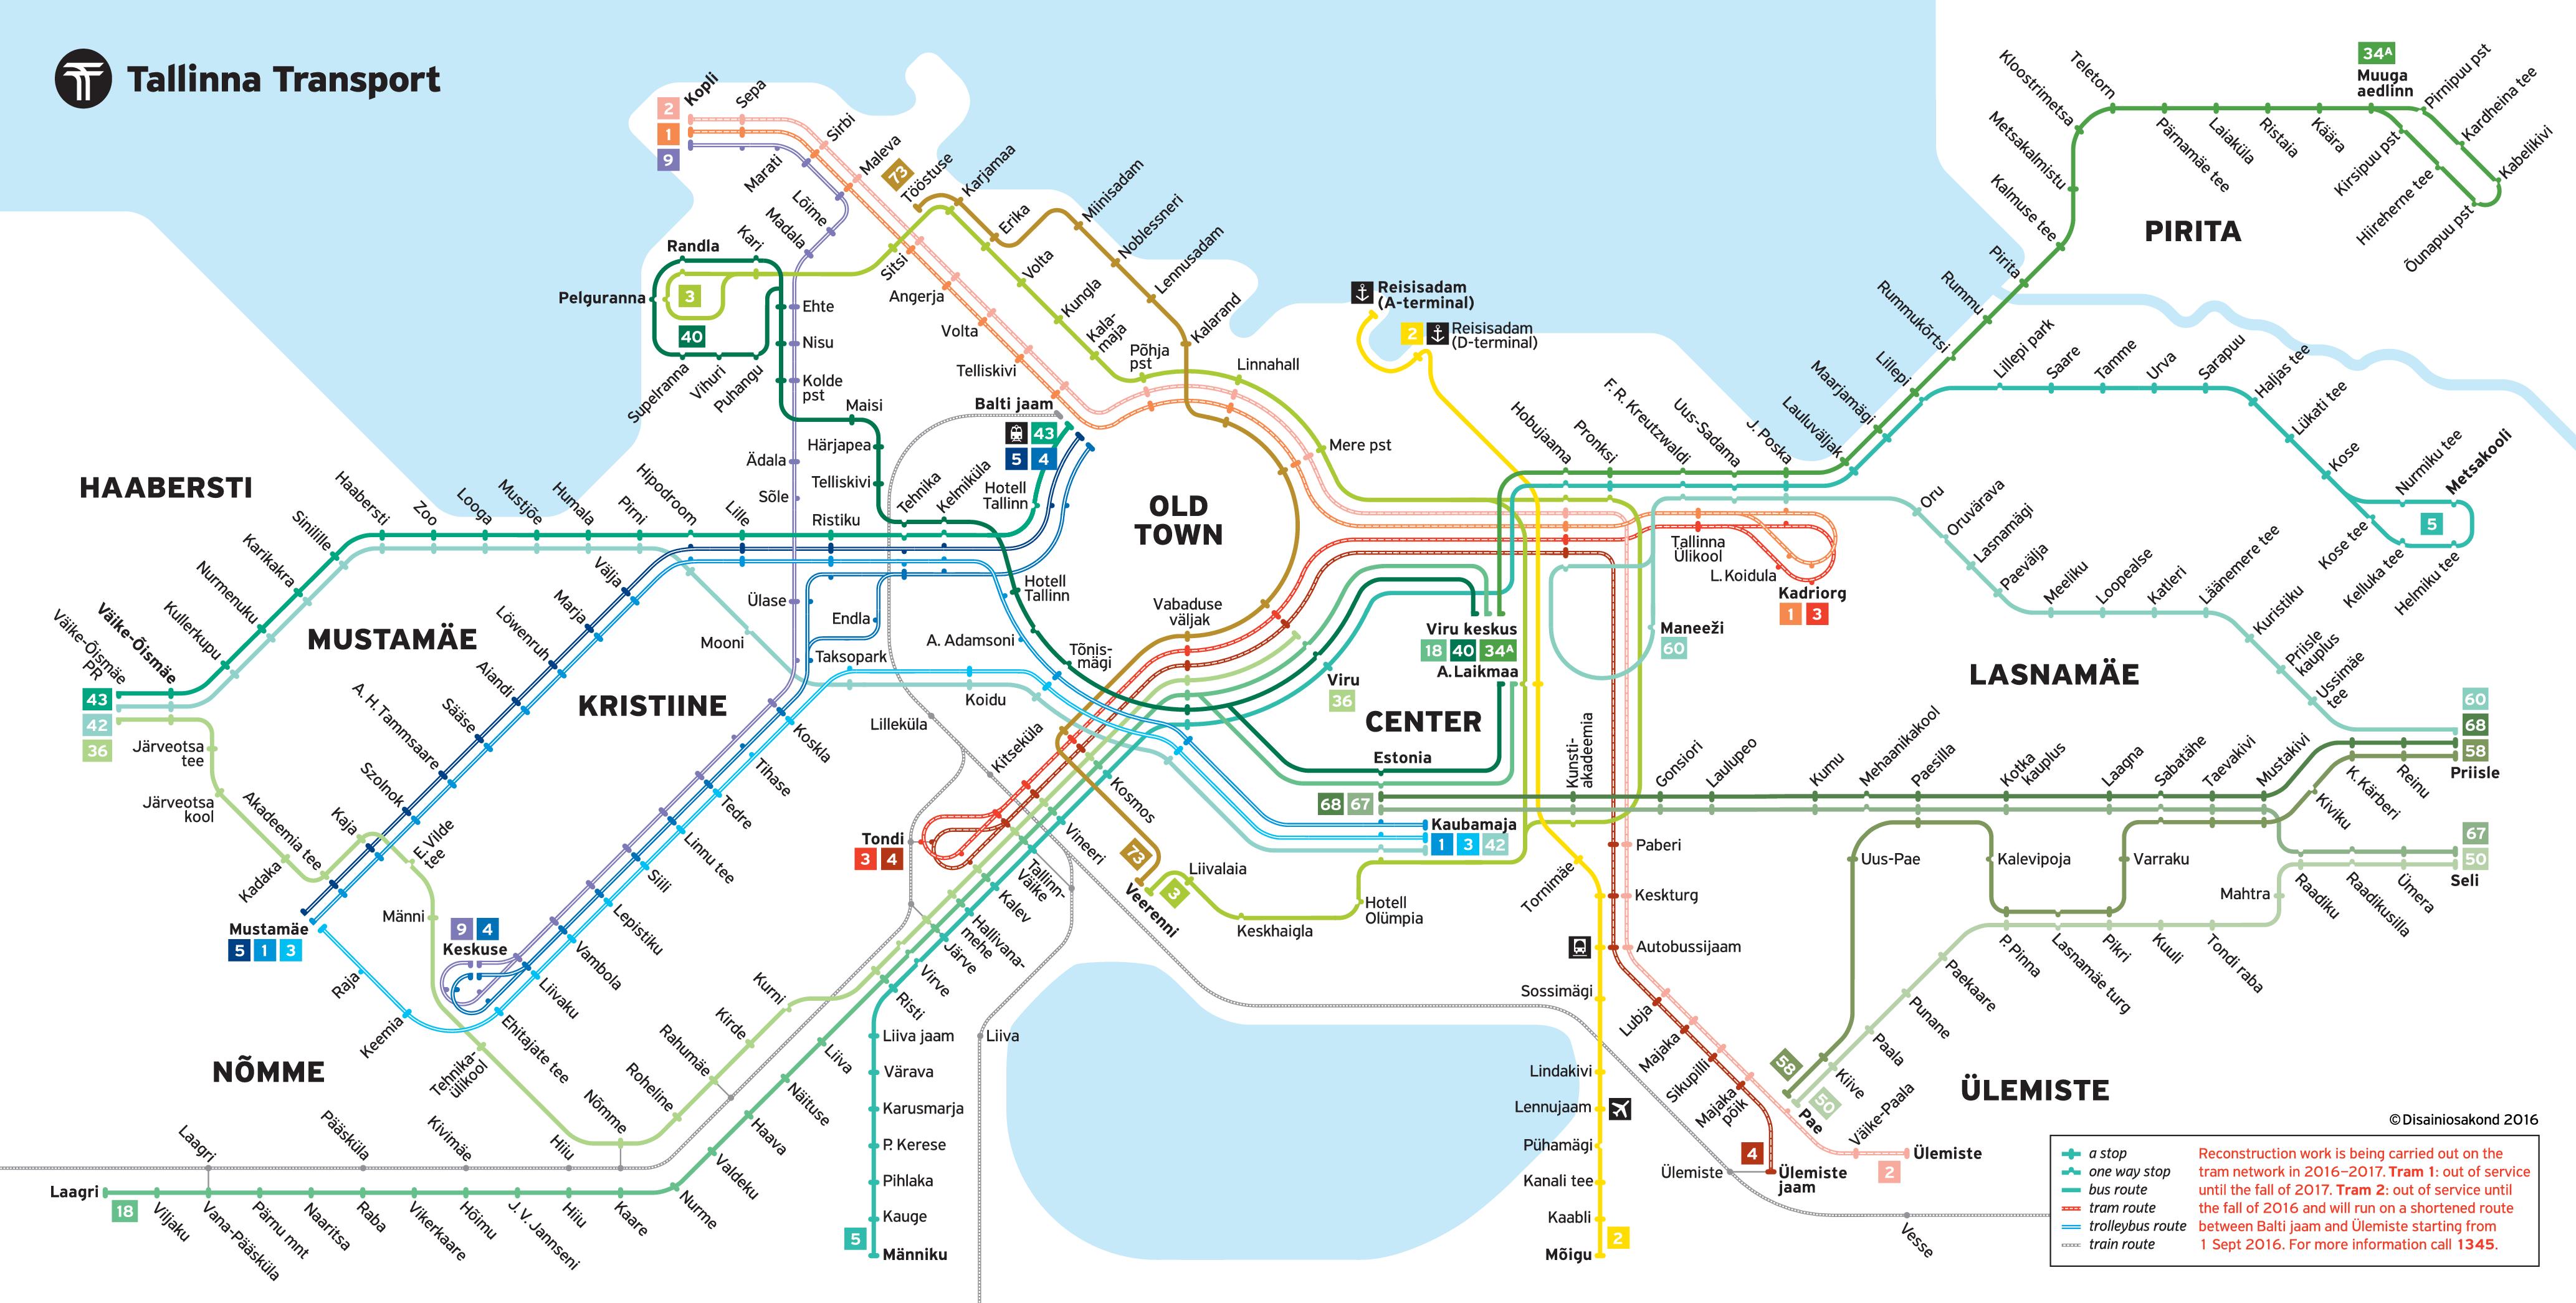 aa3cb8808c2 Public transportation in Tallinn, Estonia by Tallinna transport #map # tallinn #estonia